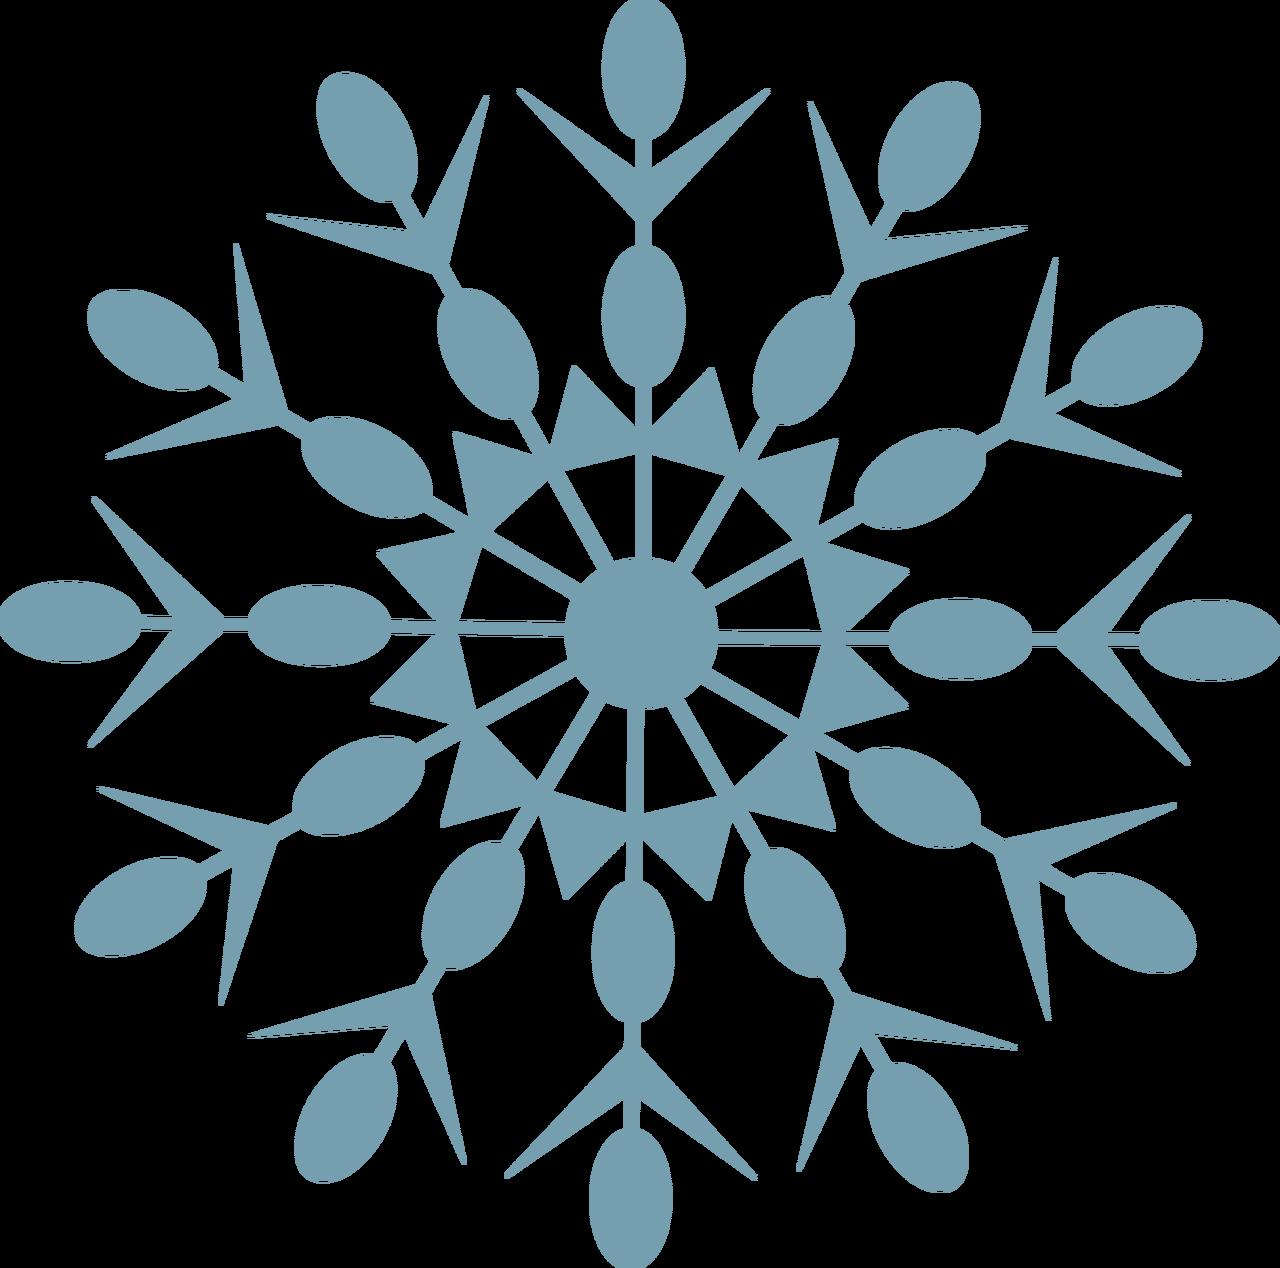 Snowflake #25 SVG Cut File